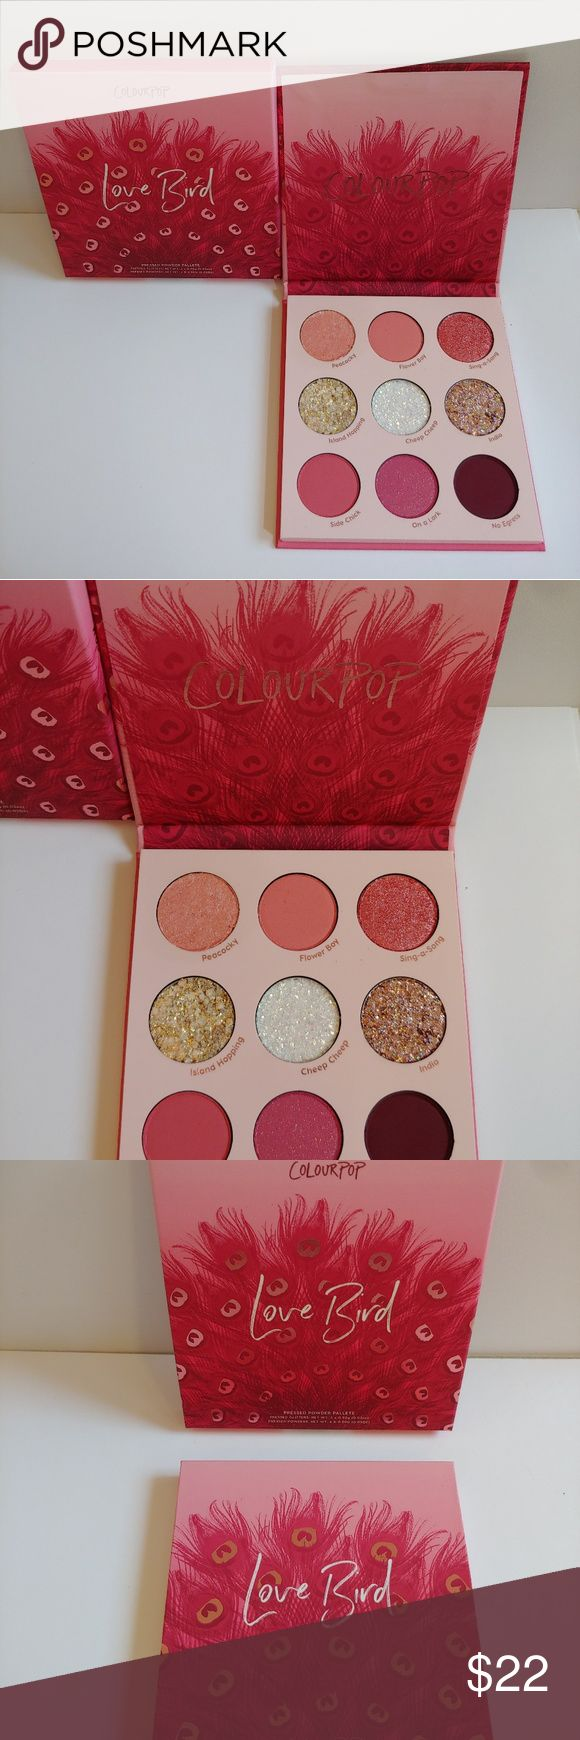 Colourpop Love Bird Eyeshadow Palette (With images